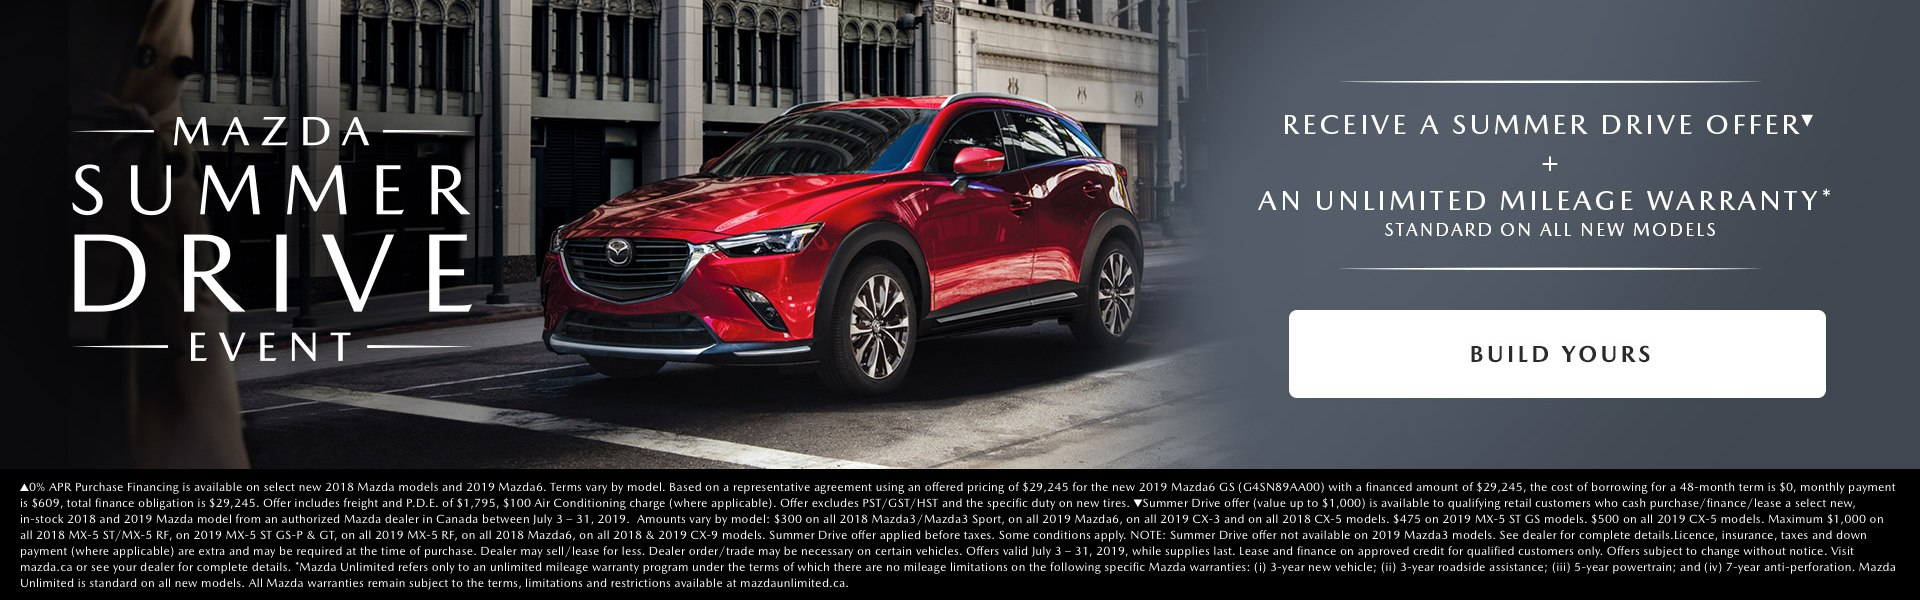 Mazda Summer Drive Event